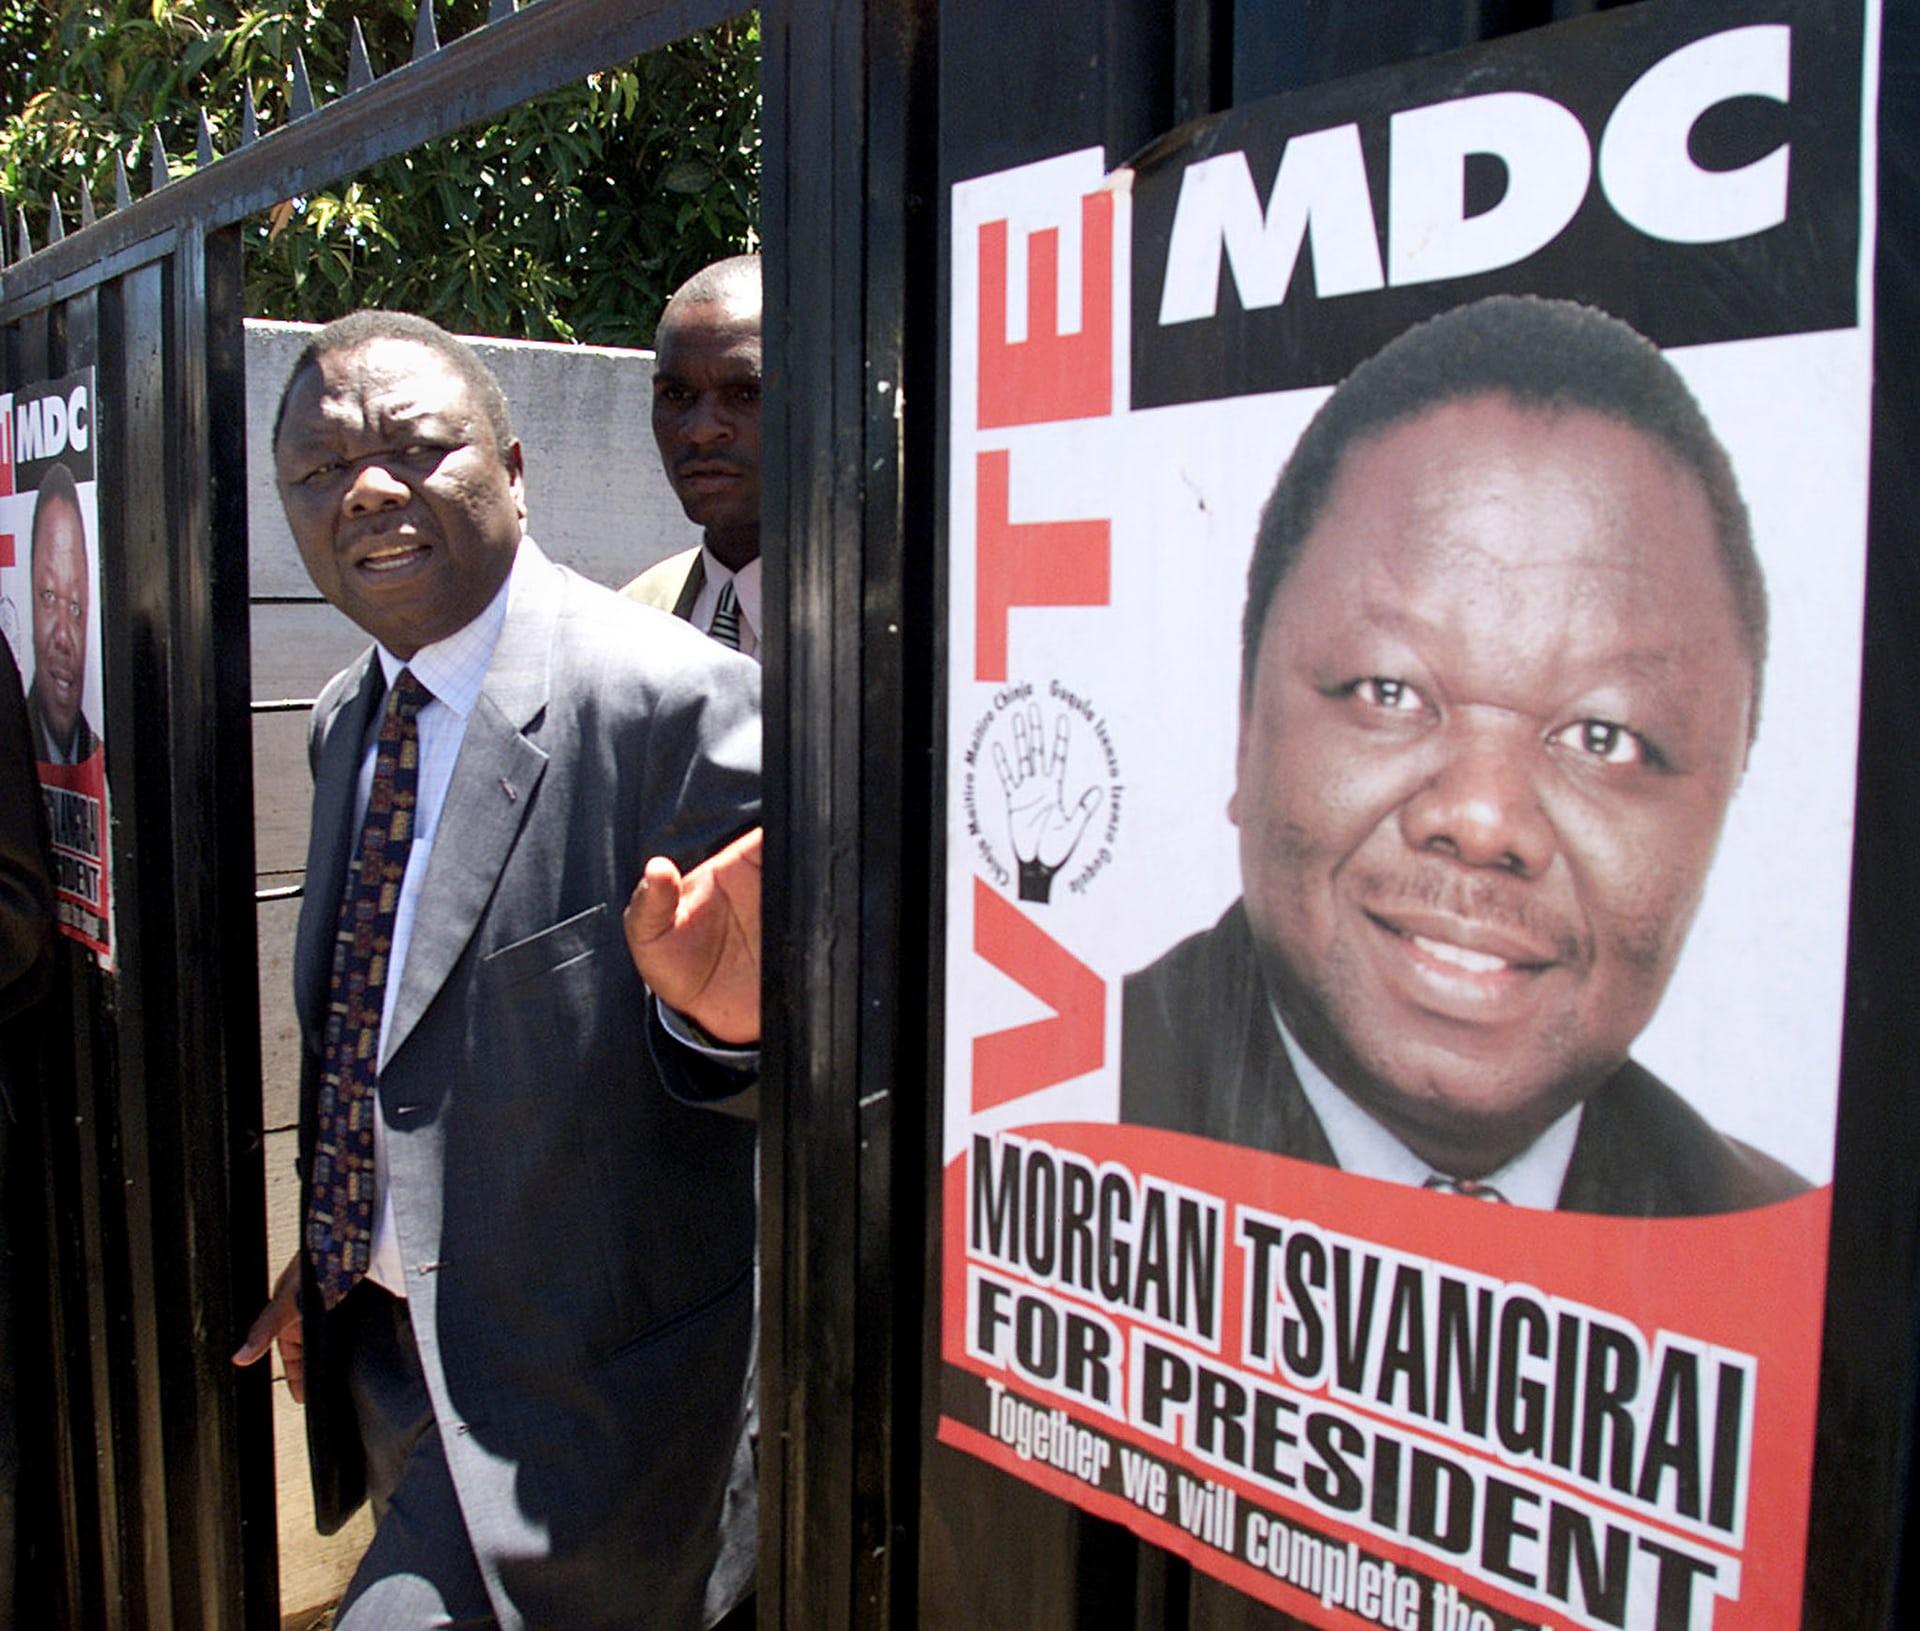 Tsvangirai leaves the house of MDC MP Tafadzwa Musekiwa in February 2002 after it was attacked by Zanu-PF supporters.